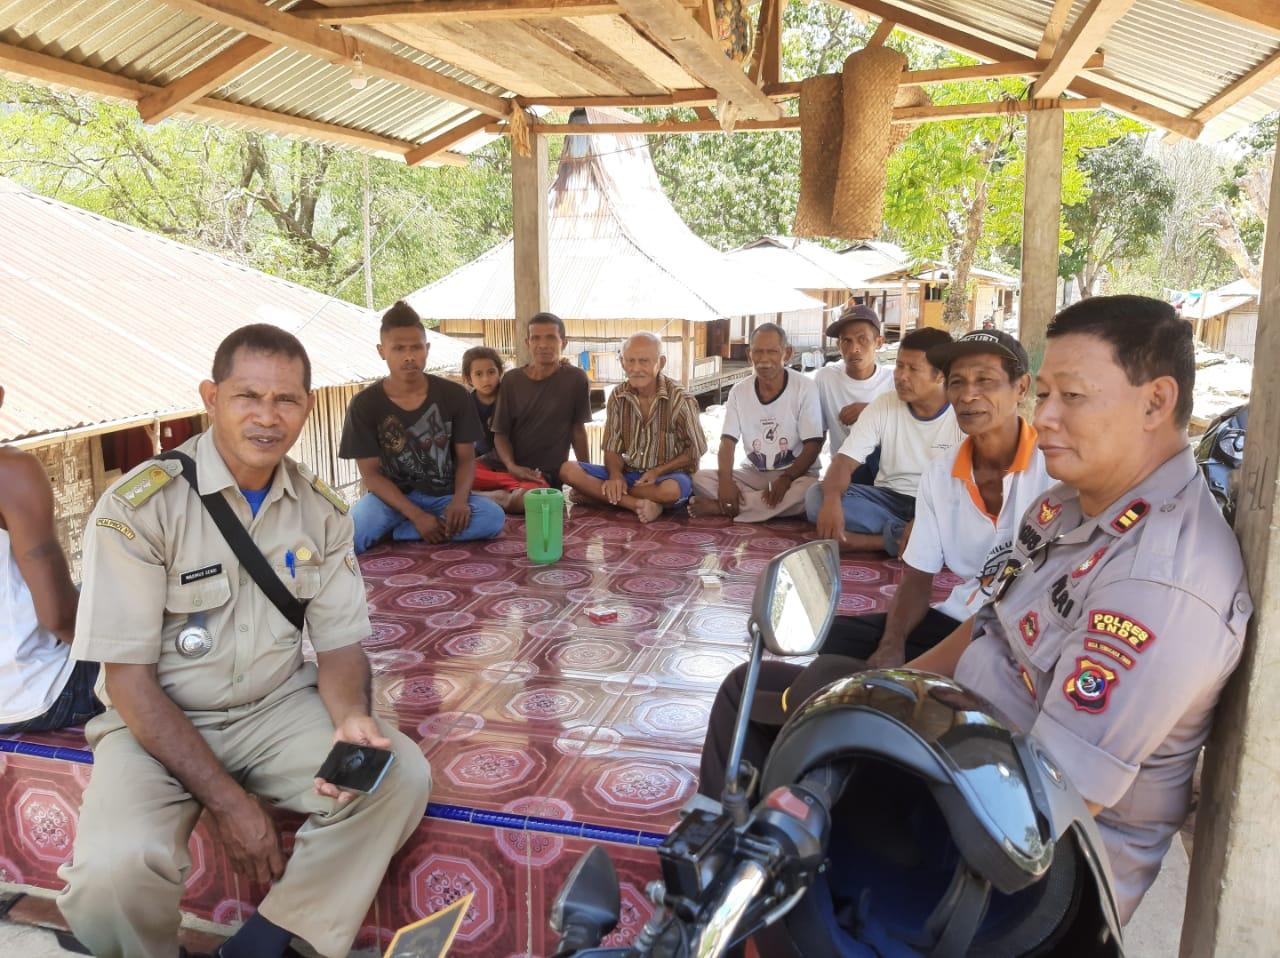 Sampaikan Pesan Kamtibmas Jelang Pilkades Kapolsek Lio Timur  Sambangi Rumah Calon Kepala Desa